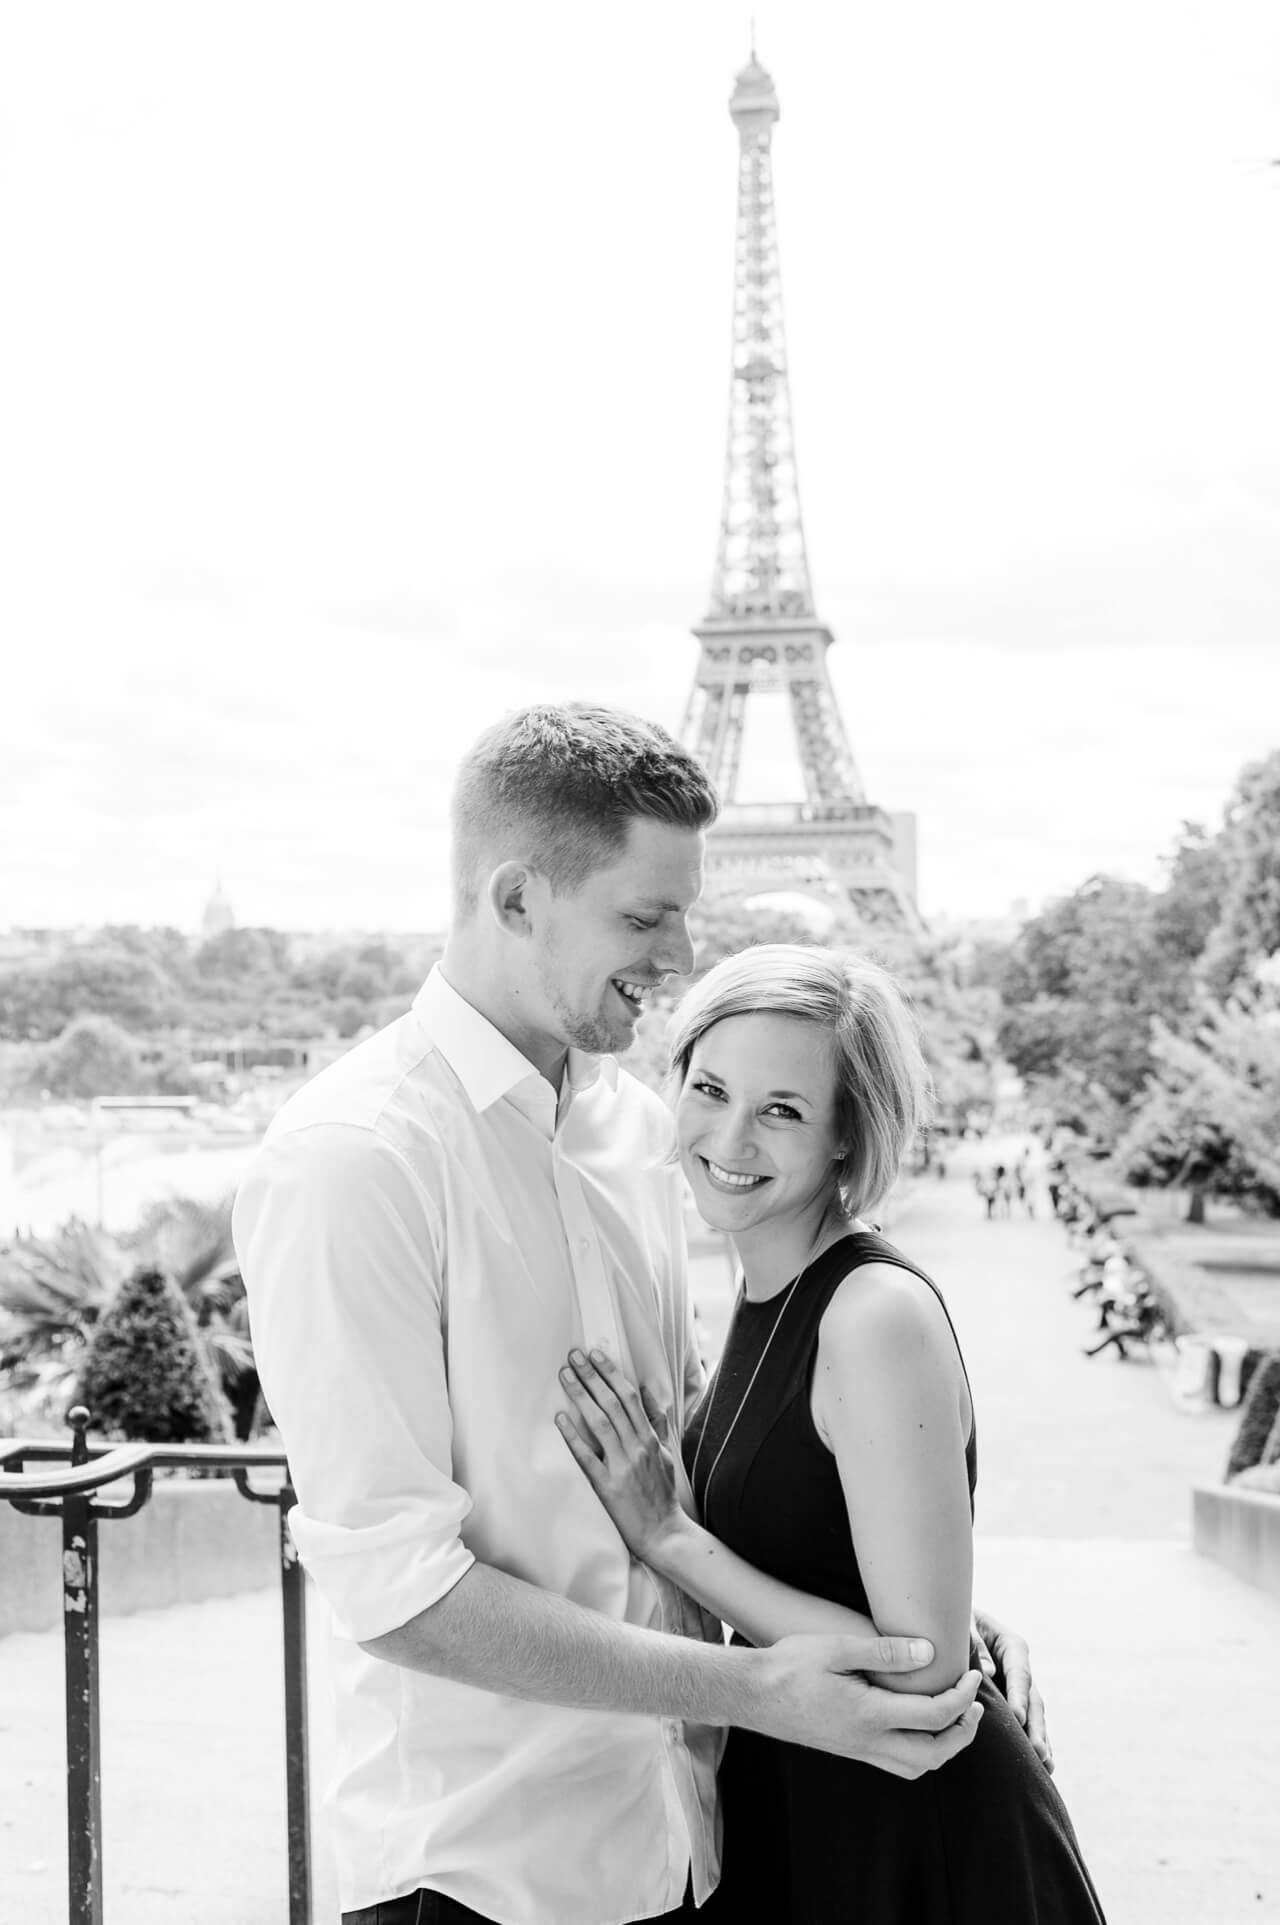 Rebecca Conte Fotografie: Paris Engagement-Shooting 02